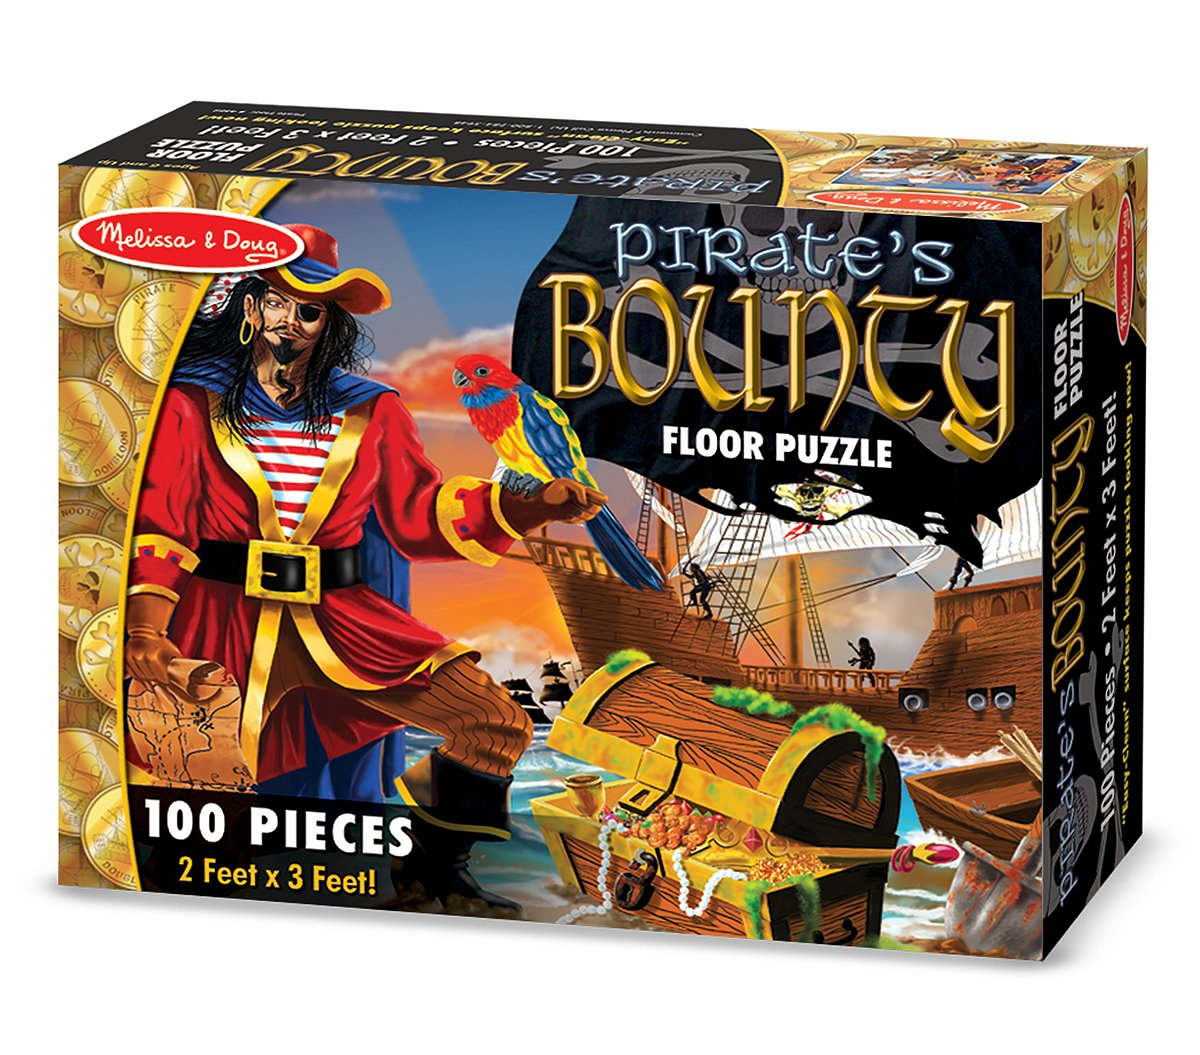 Melissa & Doug Pirate's Bounty Jumbo Jigsaw Floor Puzzle (100 pcs, 2 x 3 feet) by Melissa & Doug